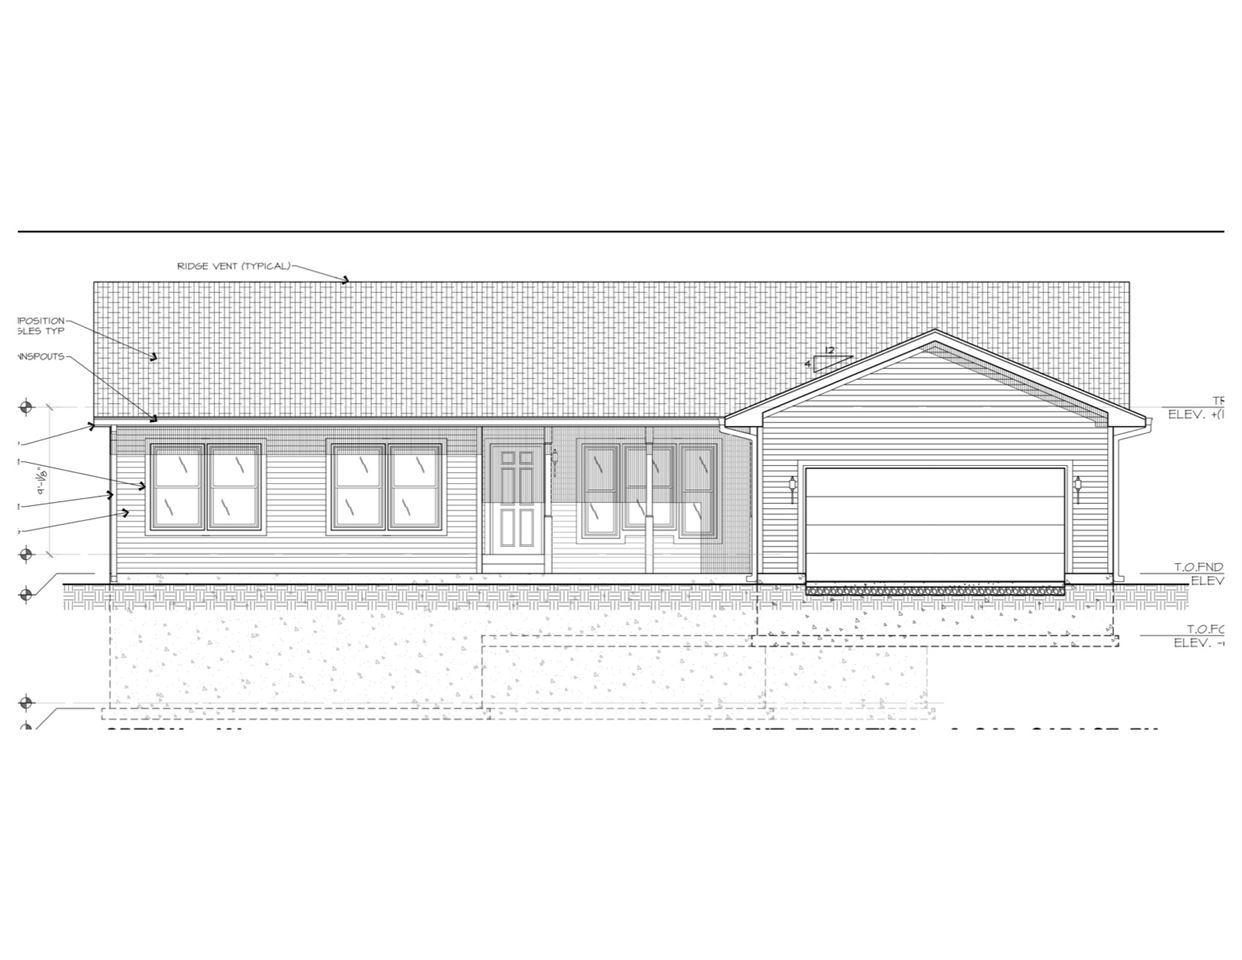 f_1904771 Properties For Sale in Edgerton